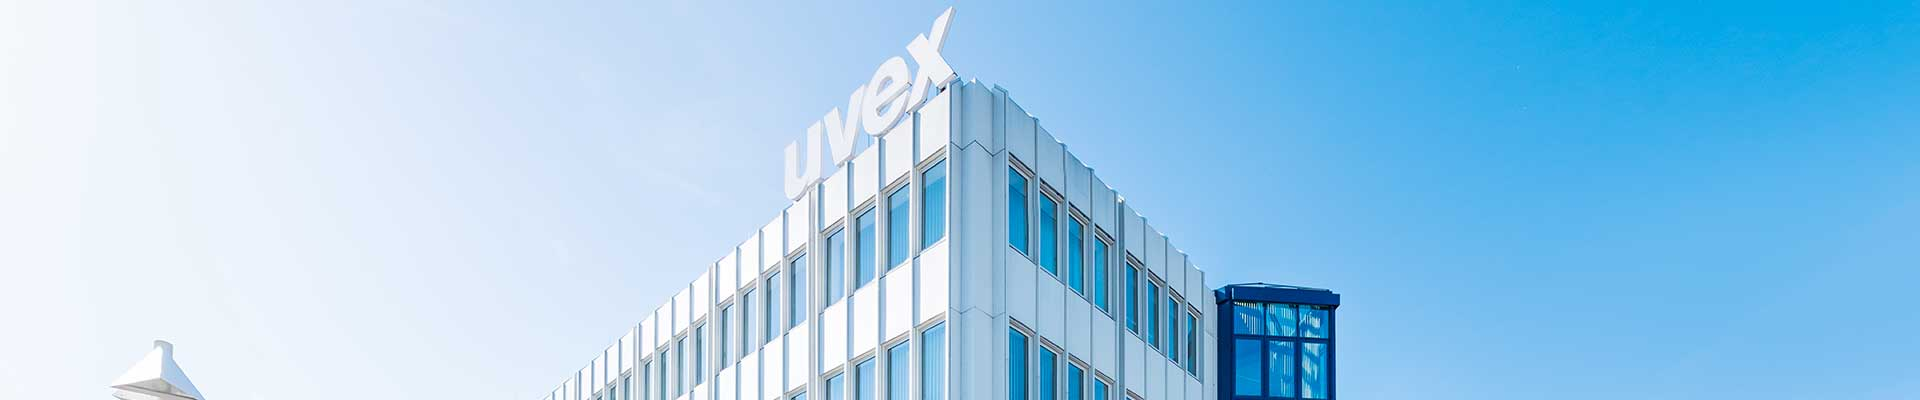 uvex group